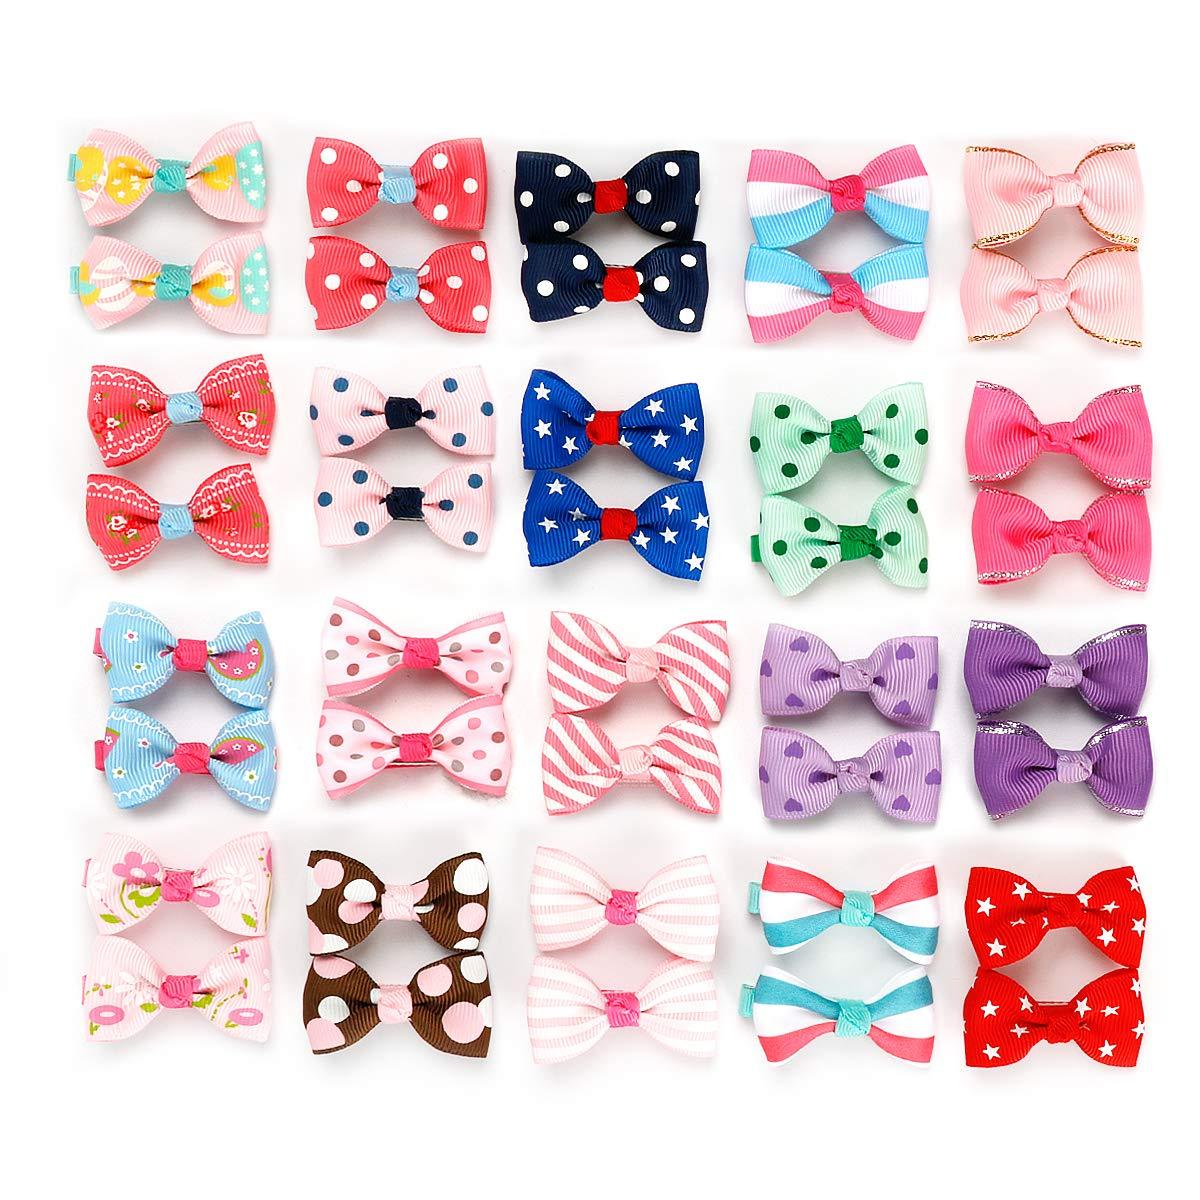 Amazon.com: sufermee 40 pcs (20 pares) bebé niñas cinta lazo ...